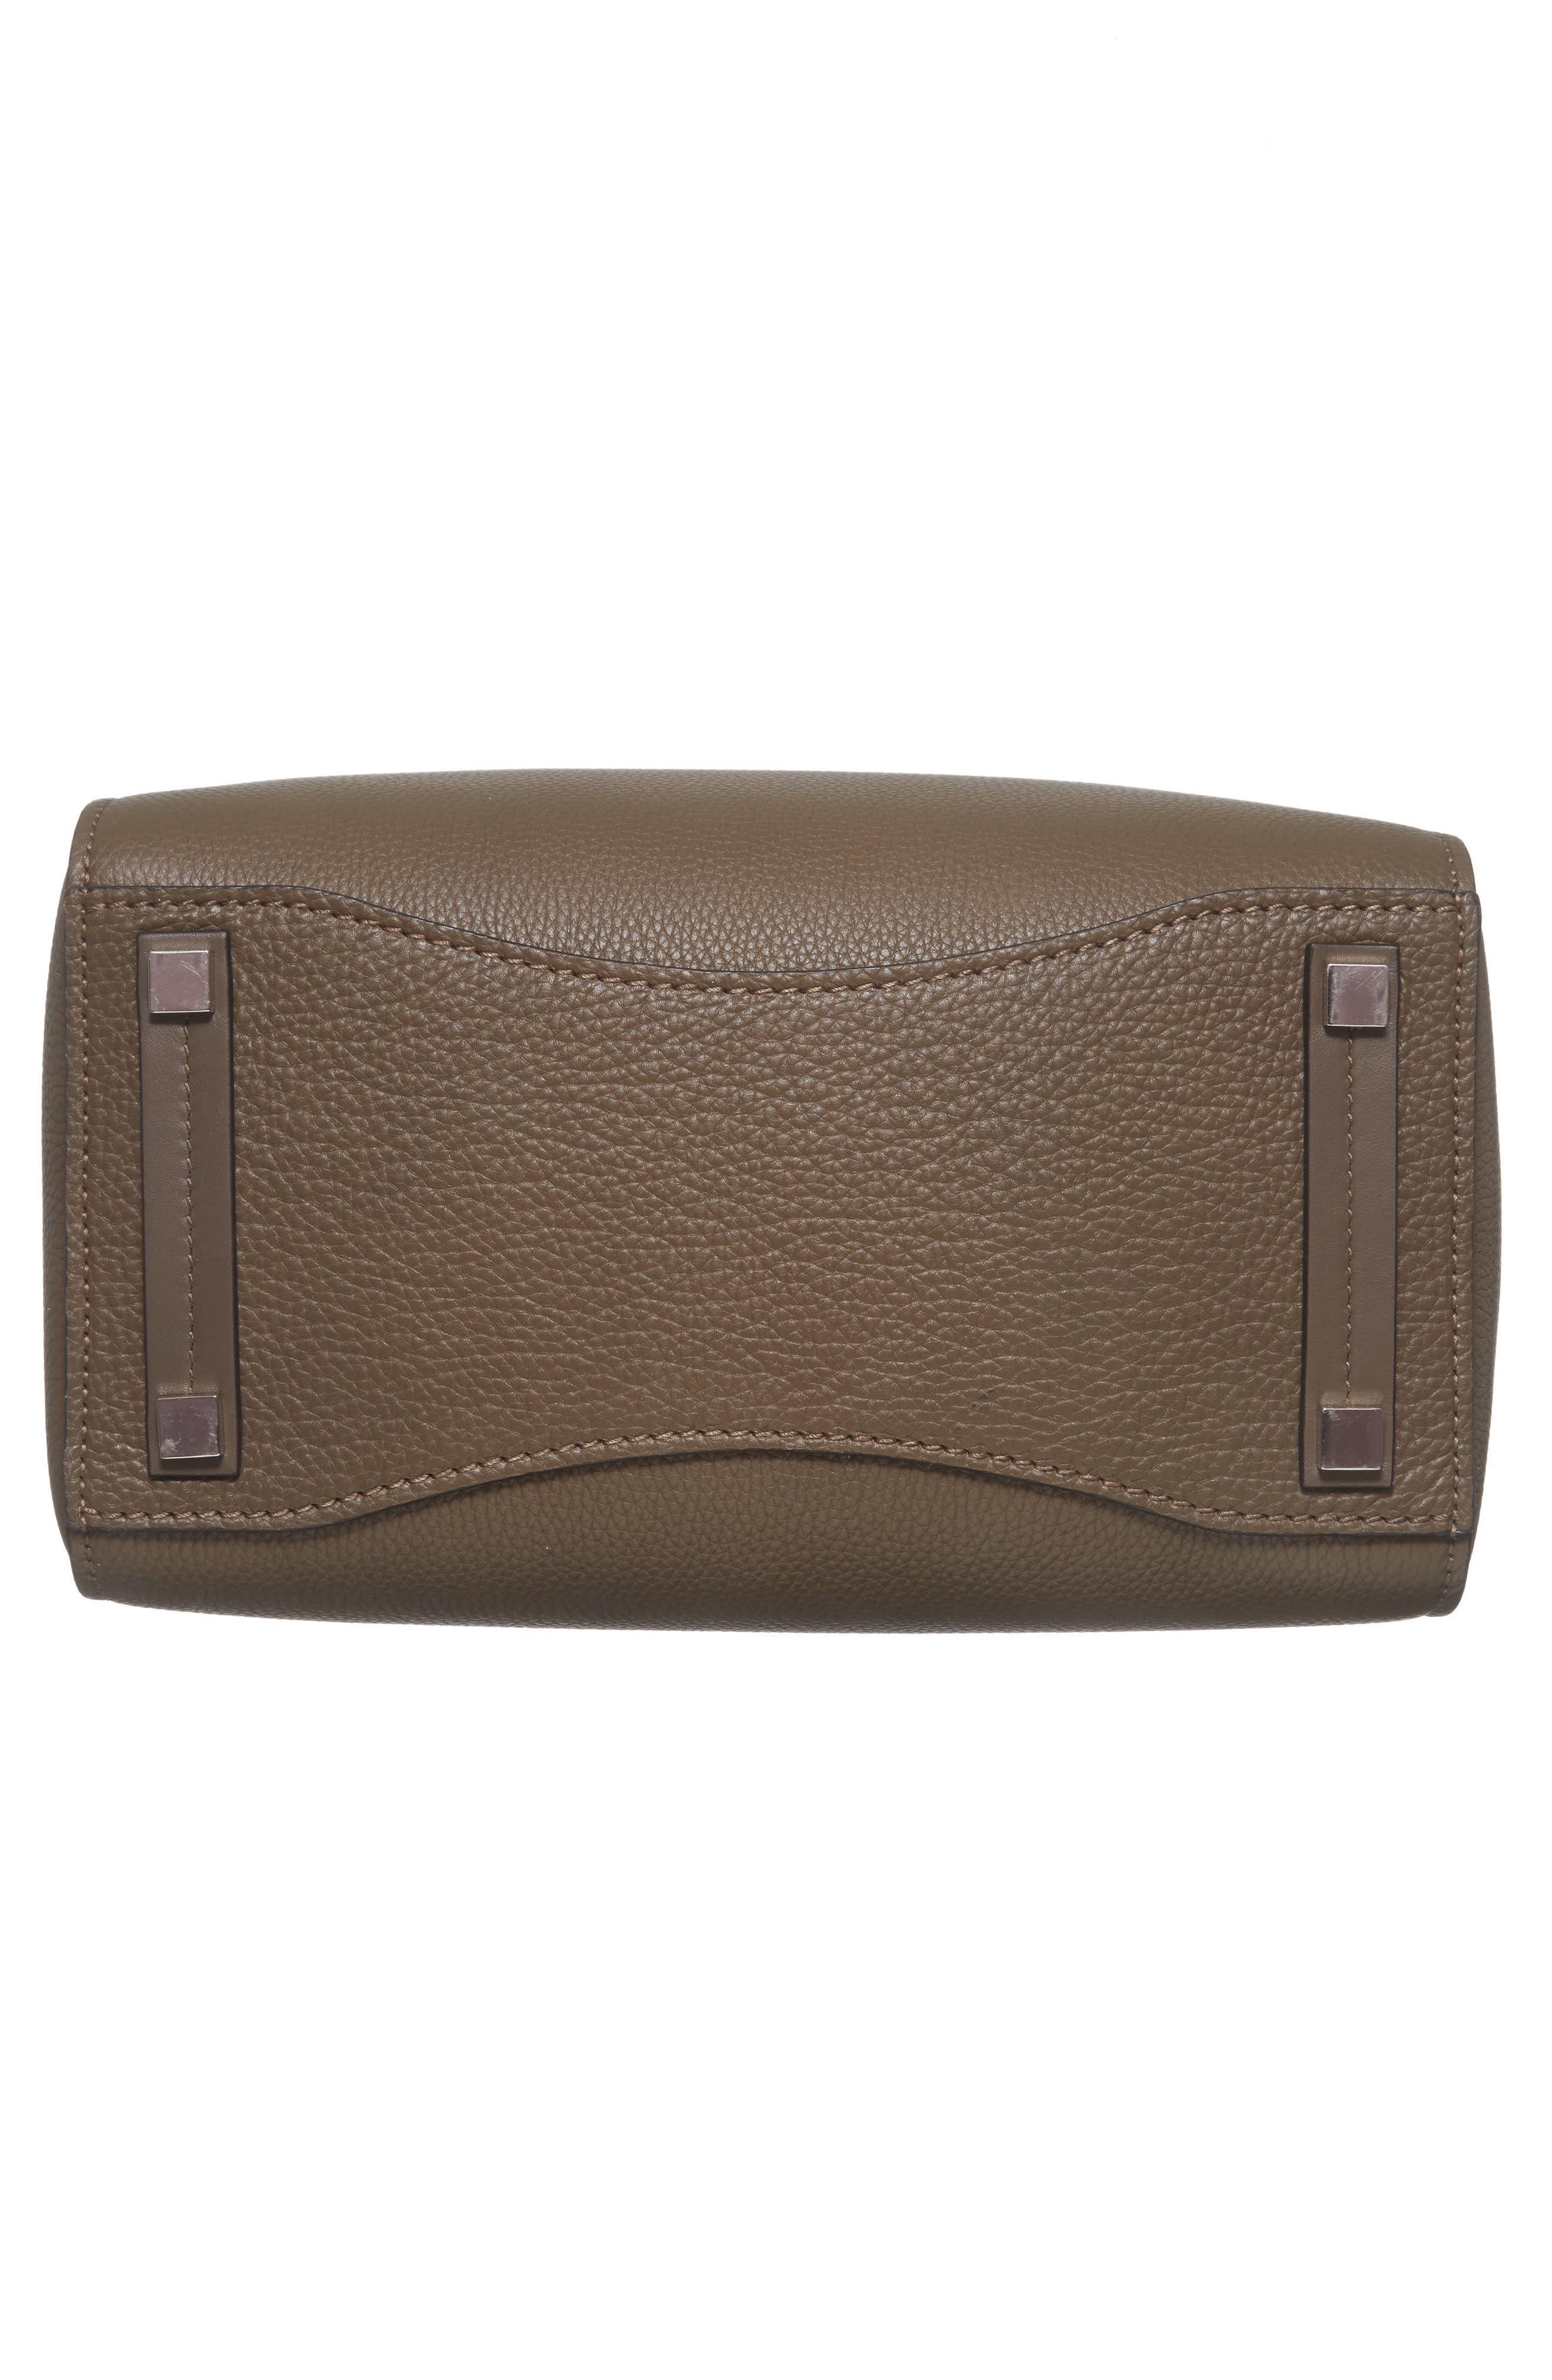 Large Barncroft Leather Convertible Satchel,                             Alternate thumbnail 6, color,                             020